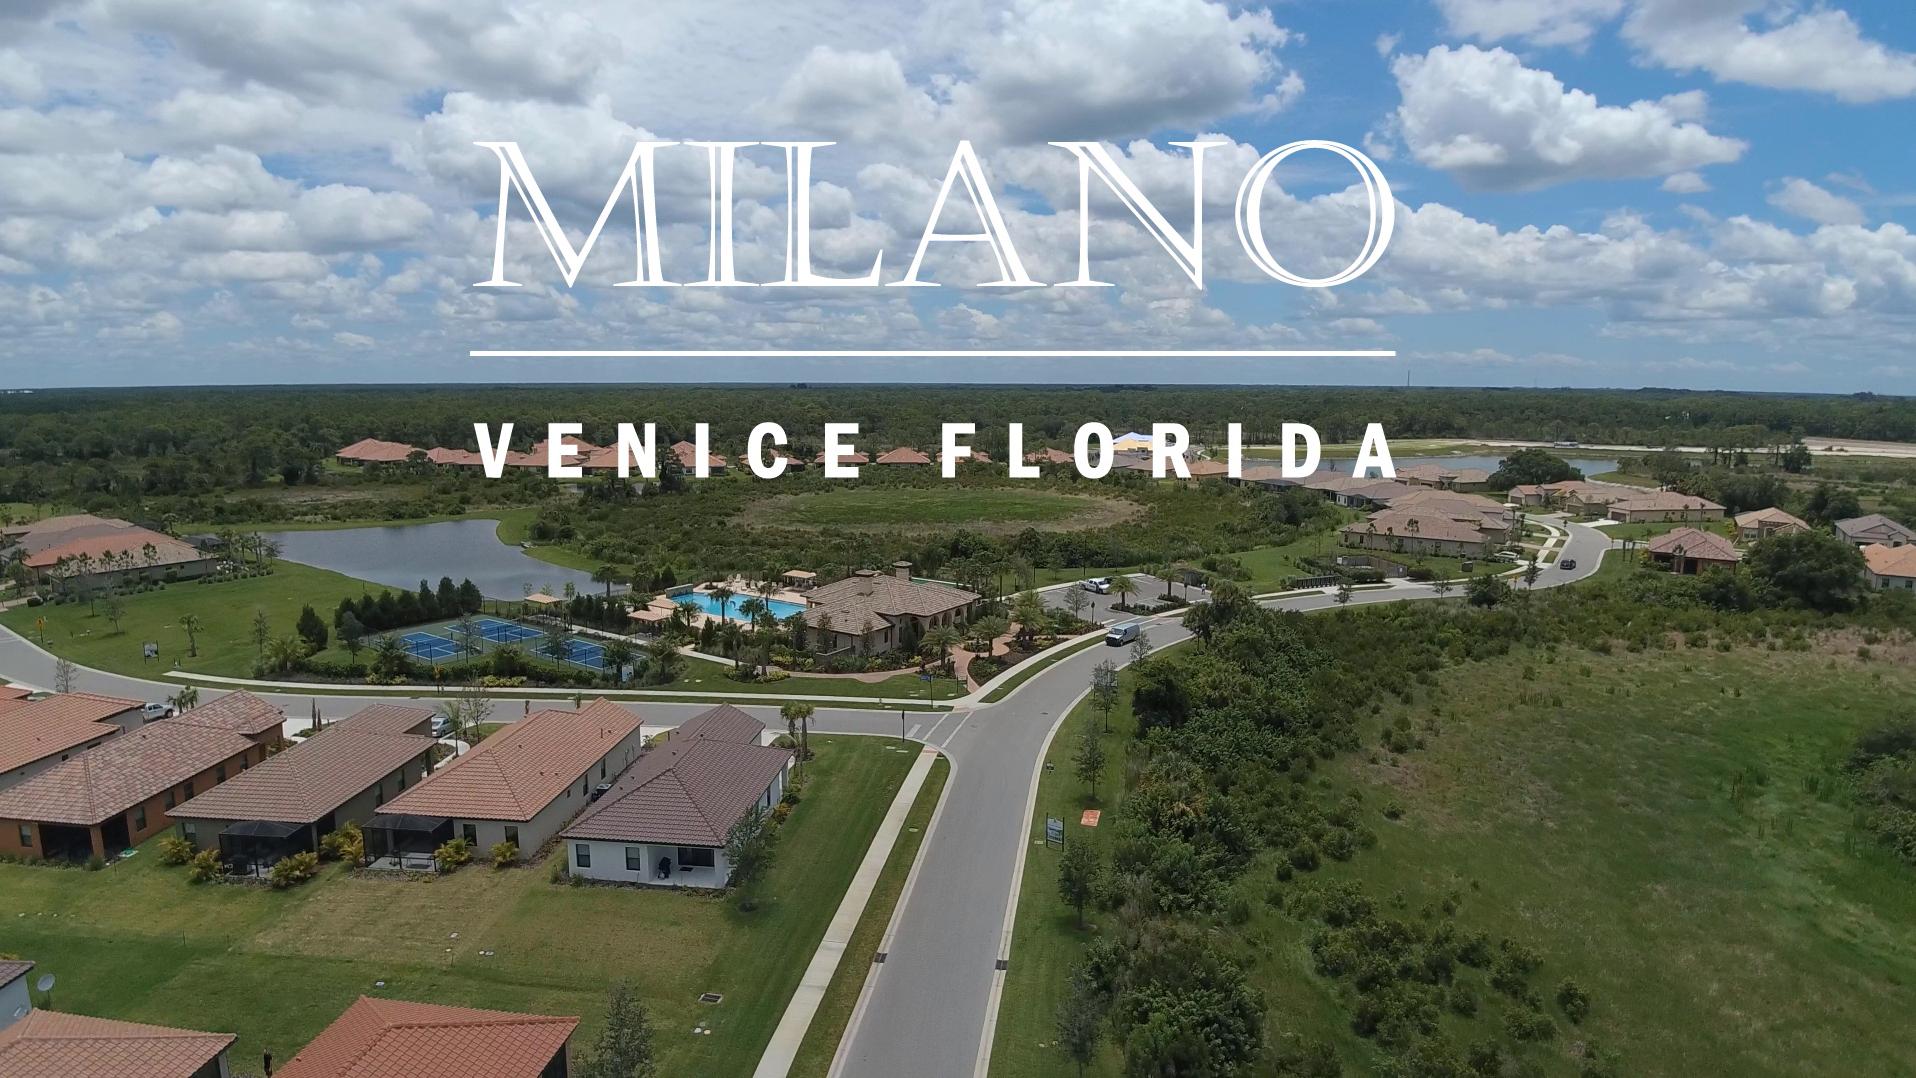 Milano Venice FL June 2017